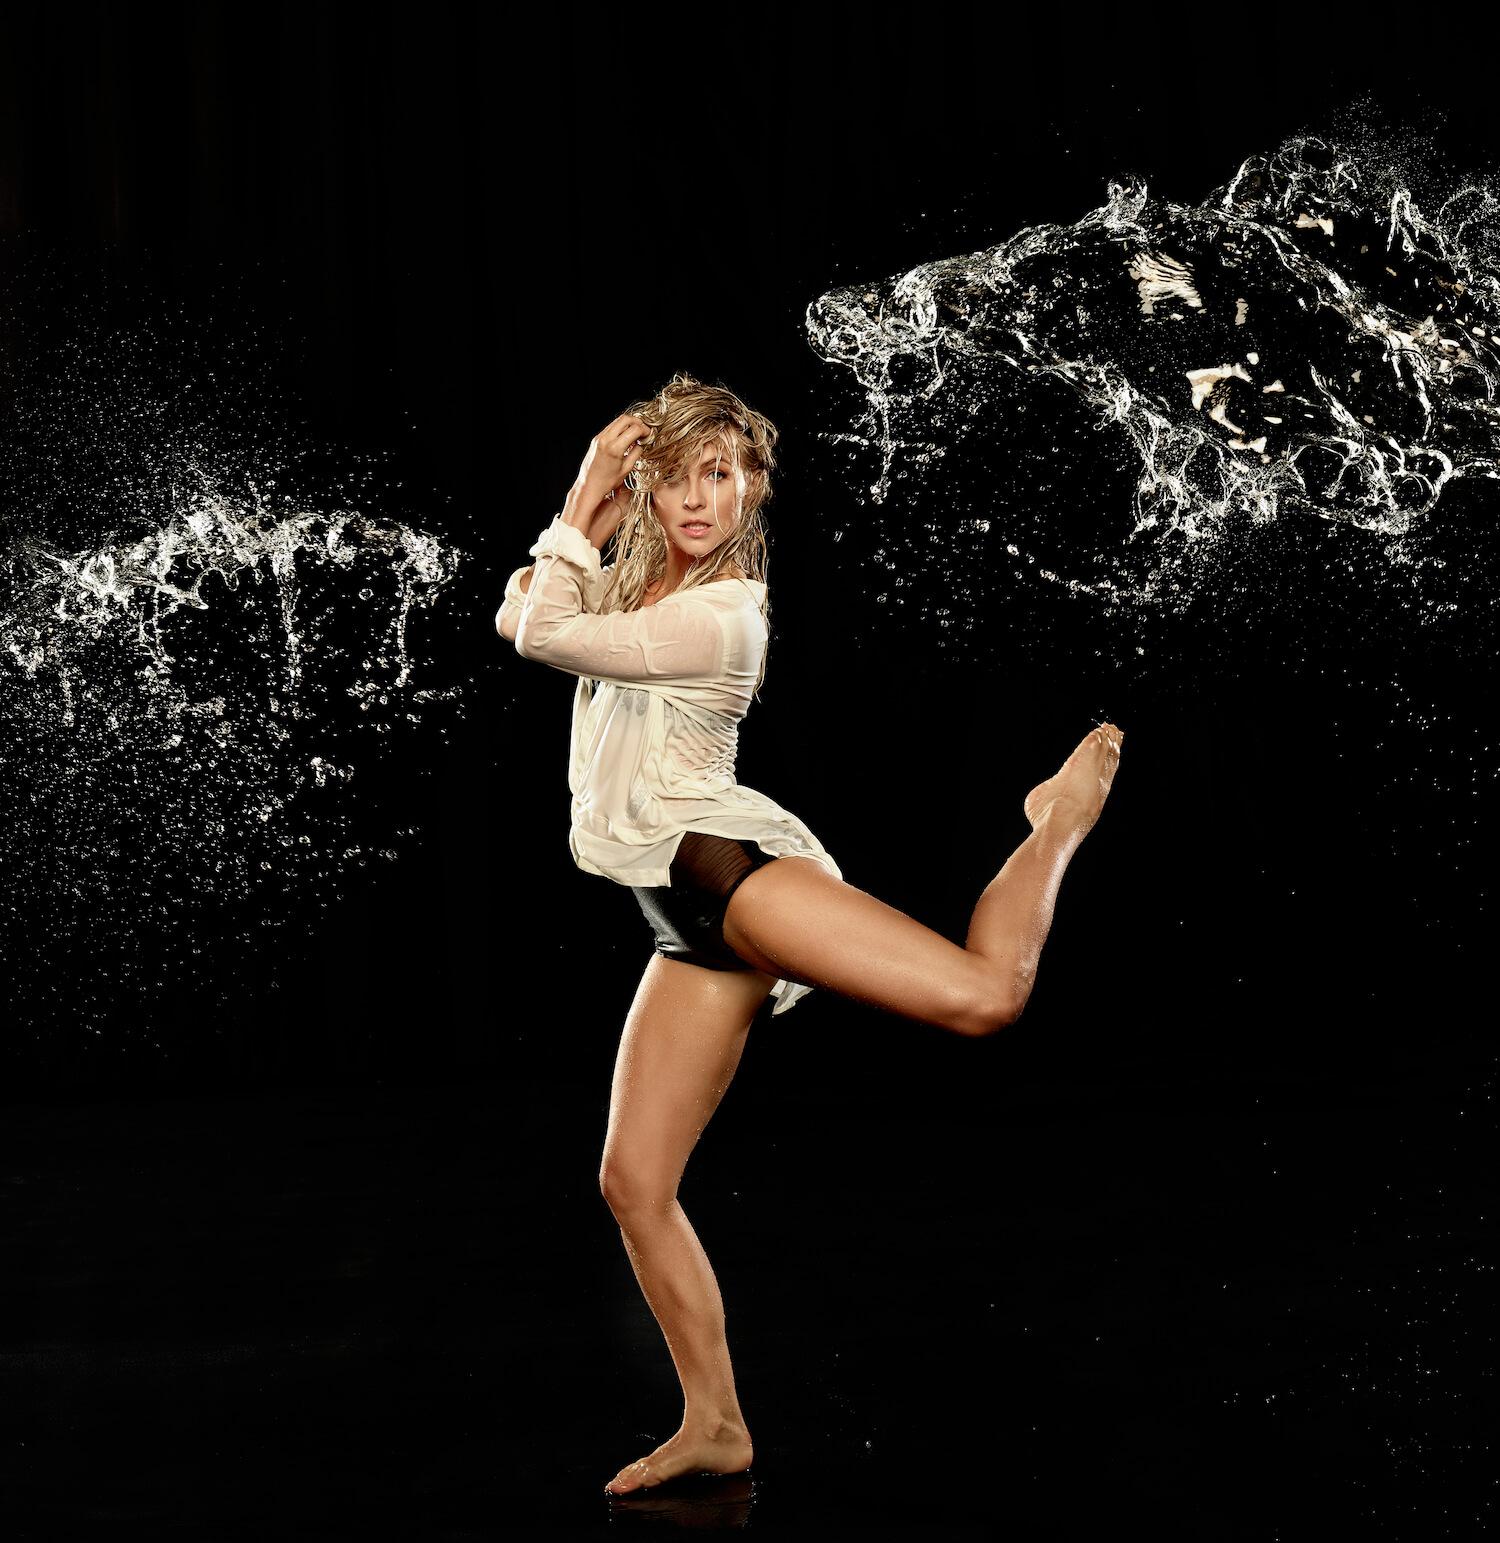 Julianne Hough And Derek Hough Dance Tour